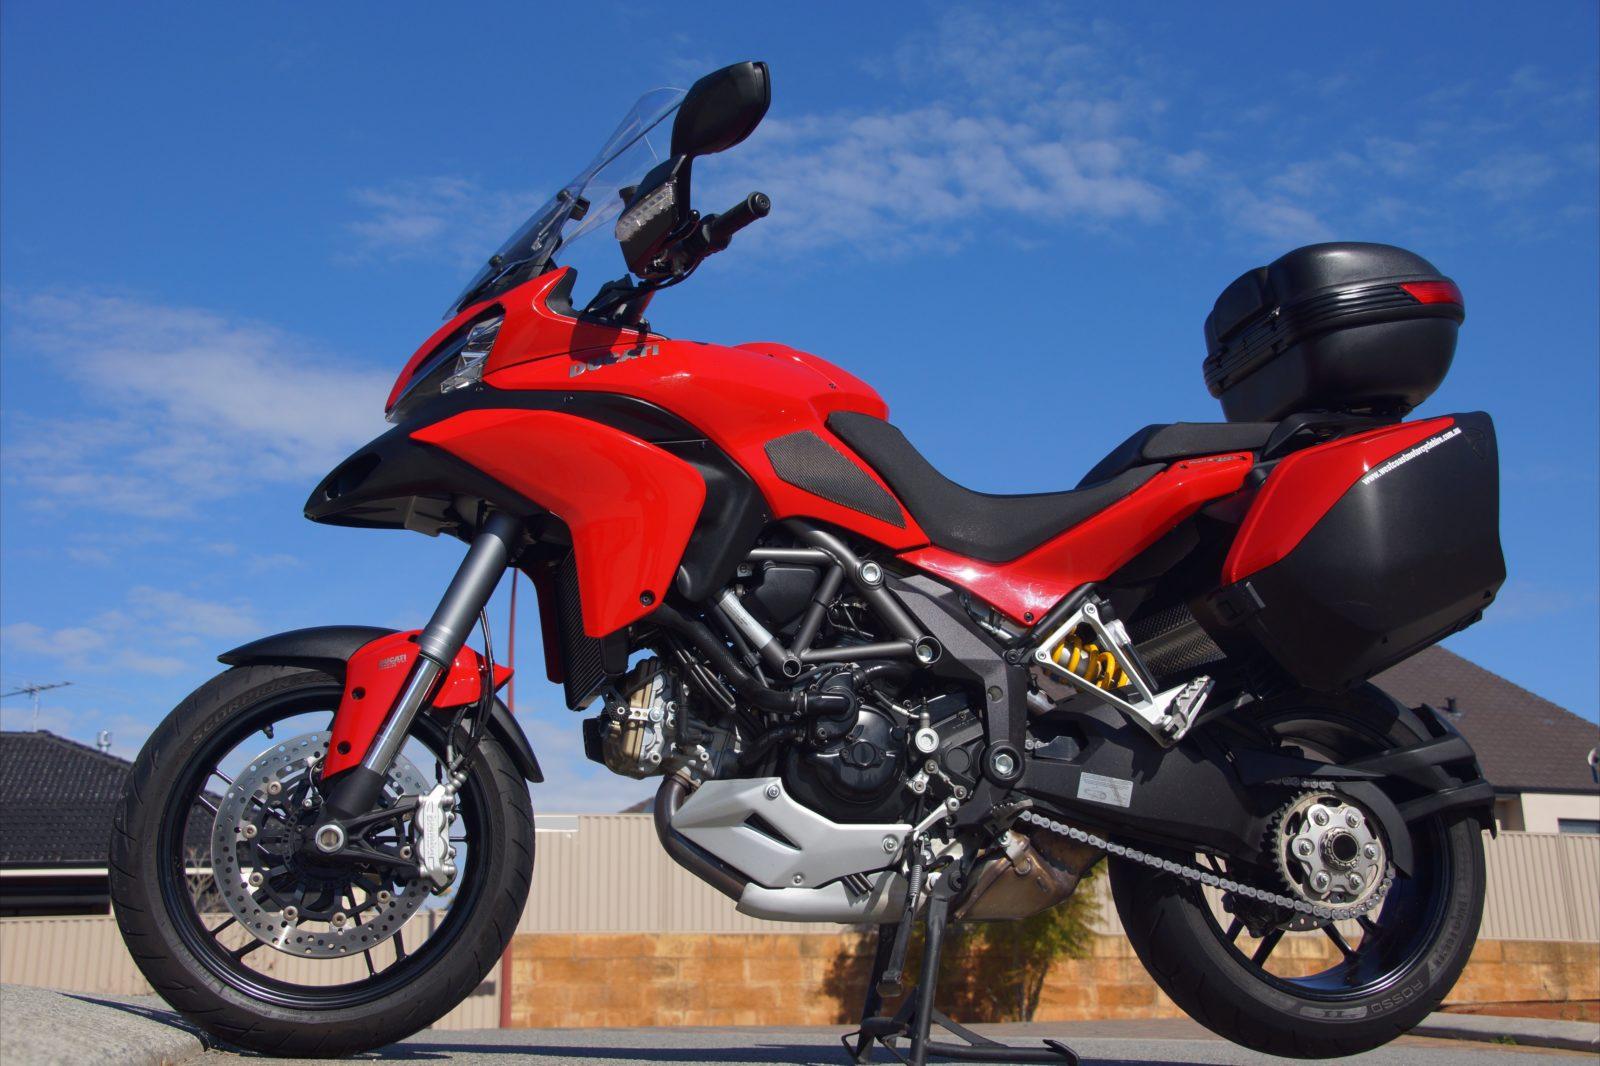 West Coast Motorcycle Hire, Darch, Western Australia